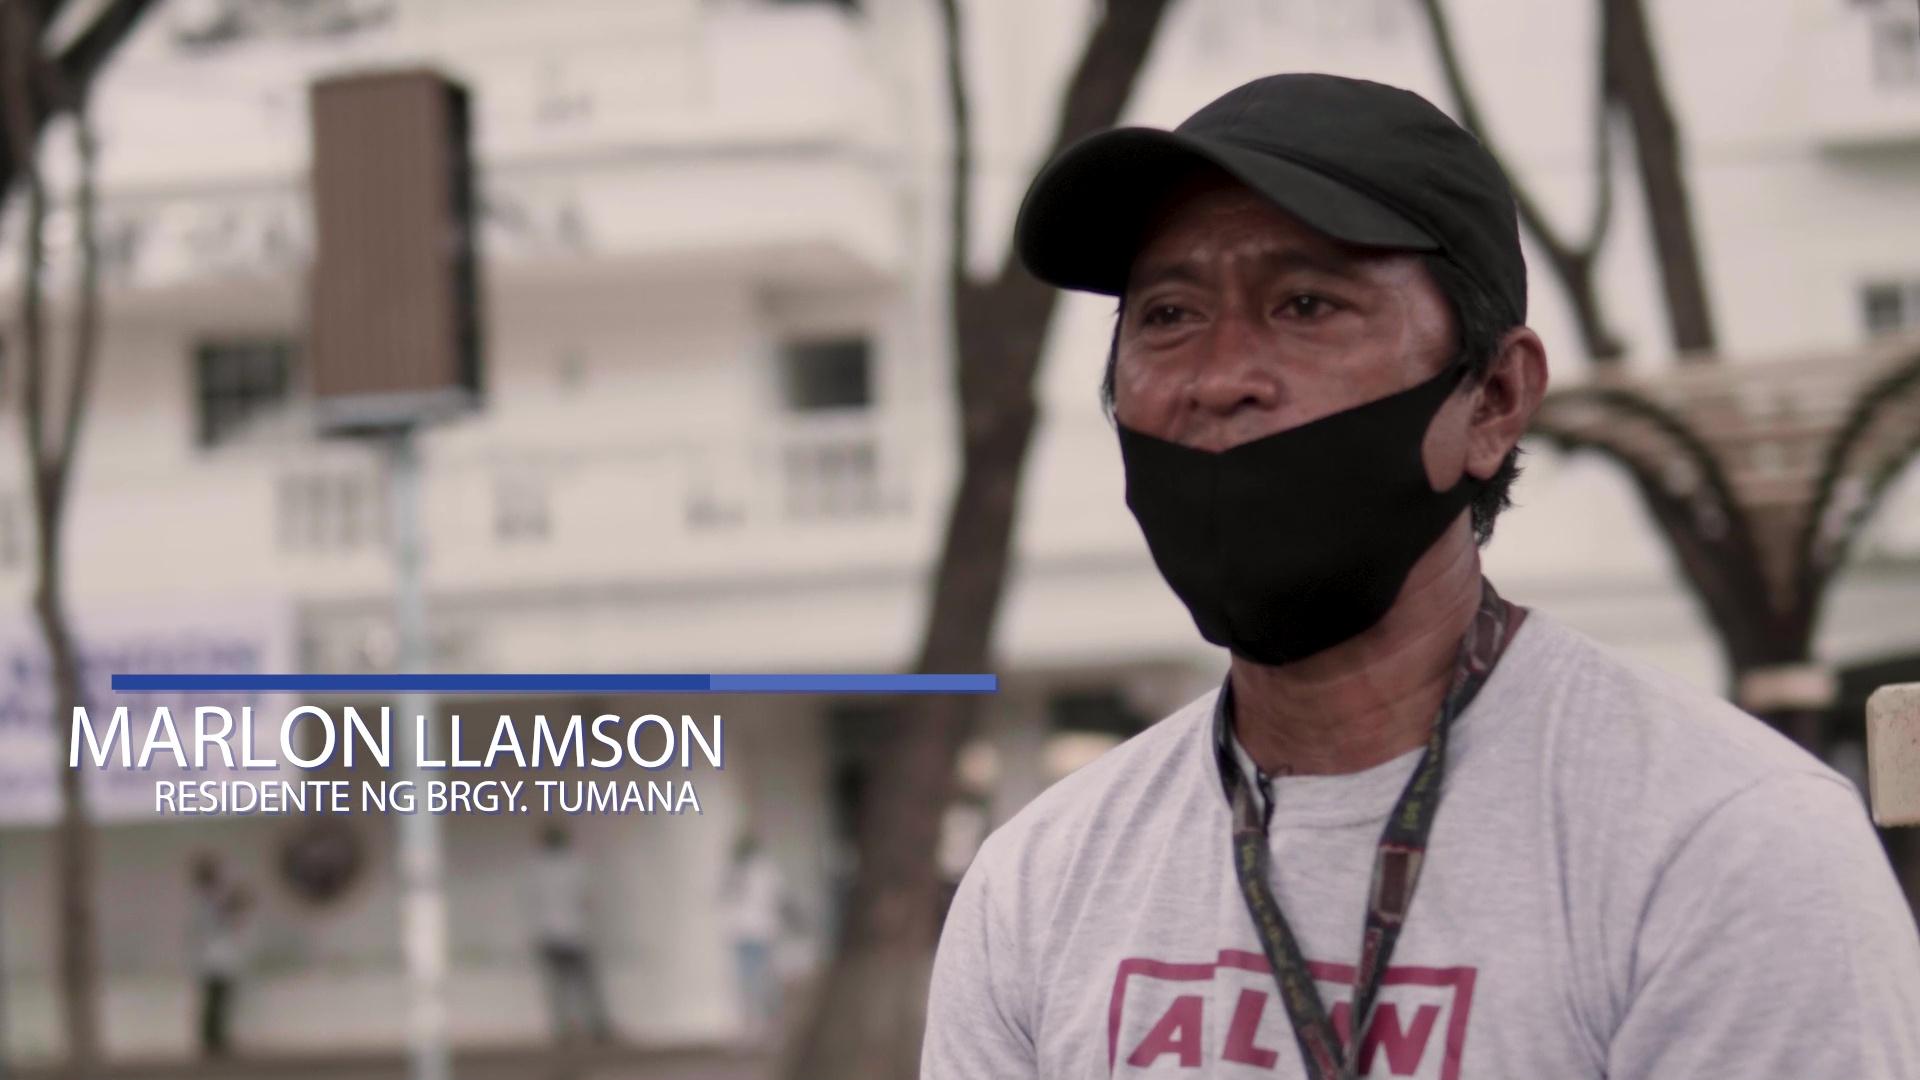 Globe's strong connectivity in Marikina spells better disaster preparedness for its residents